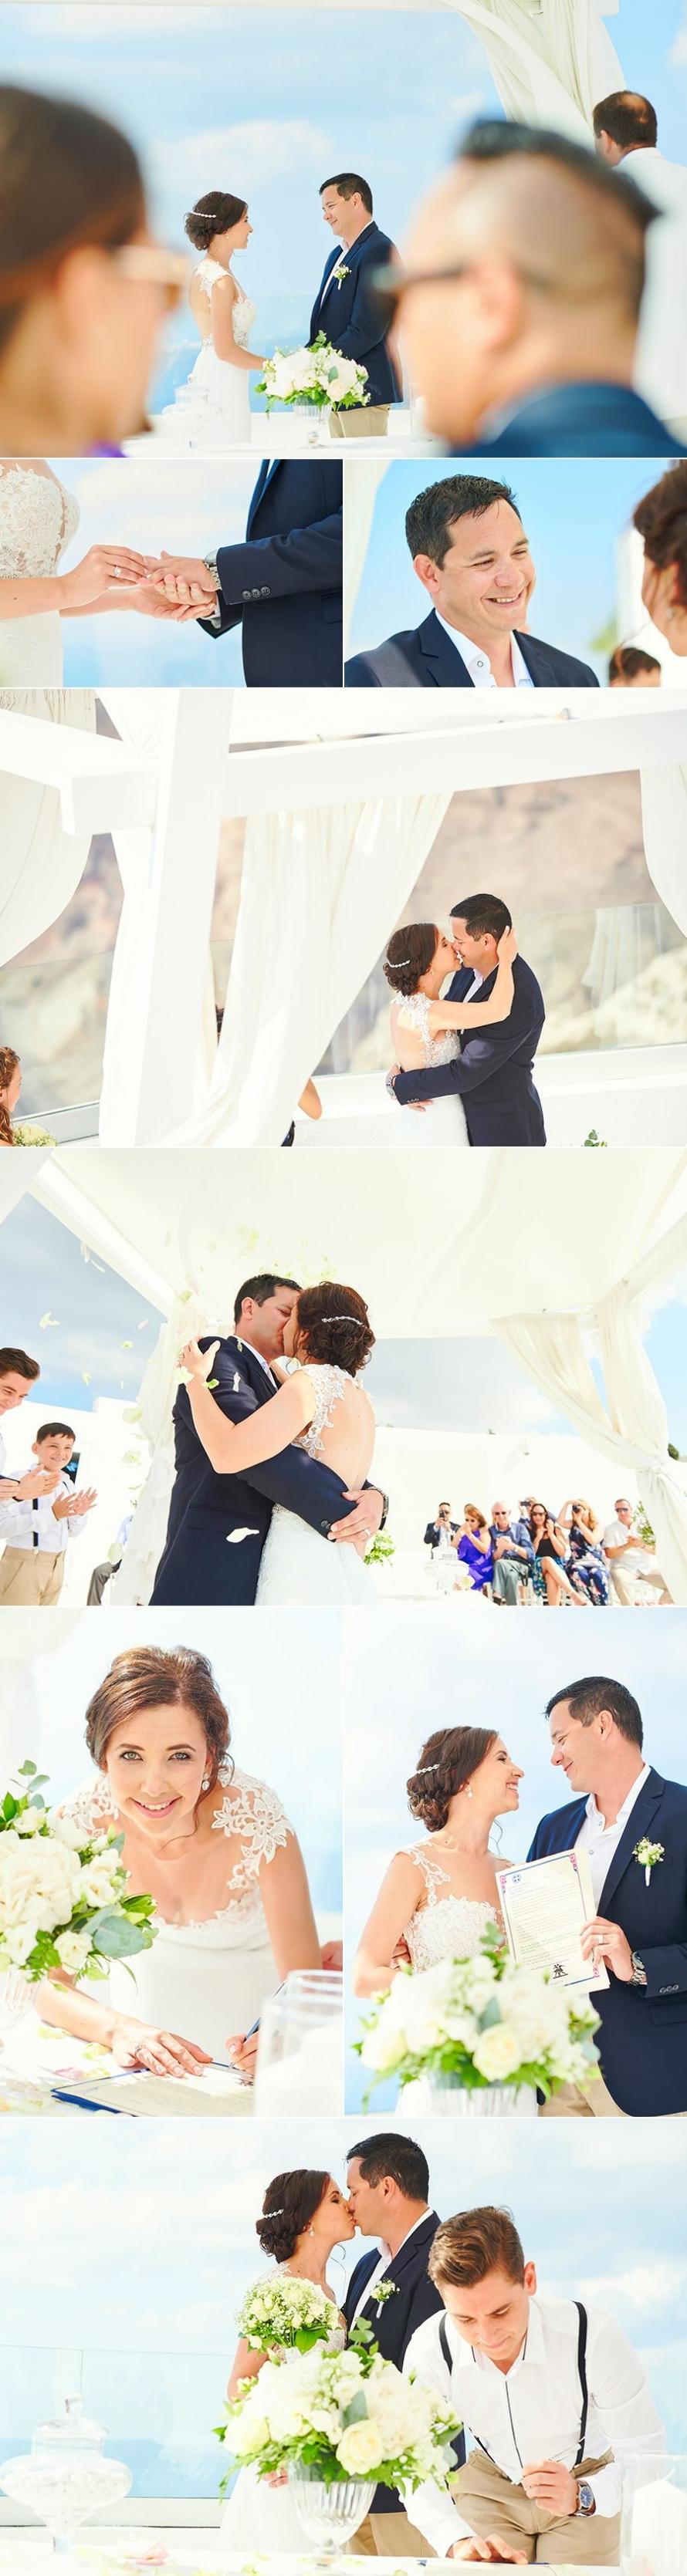 paul-simone-wedding-photos-06